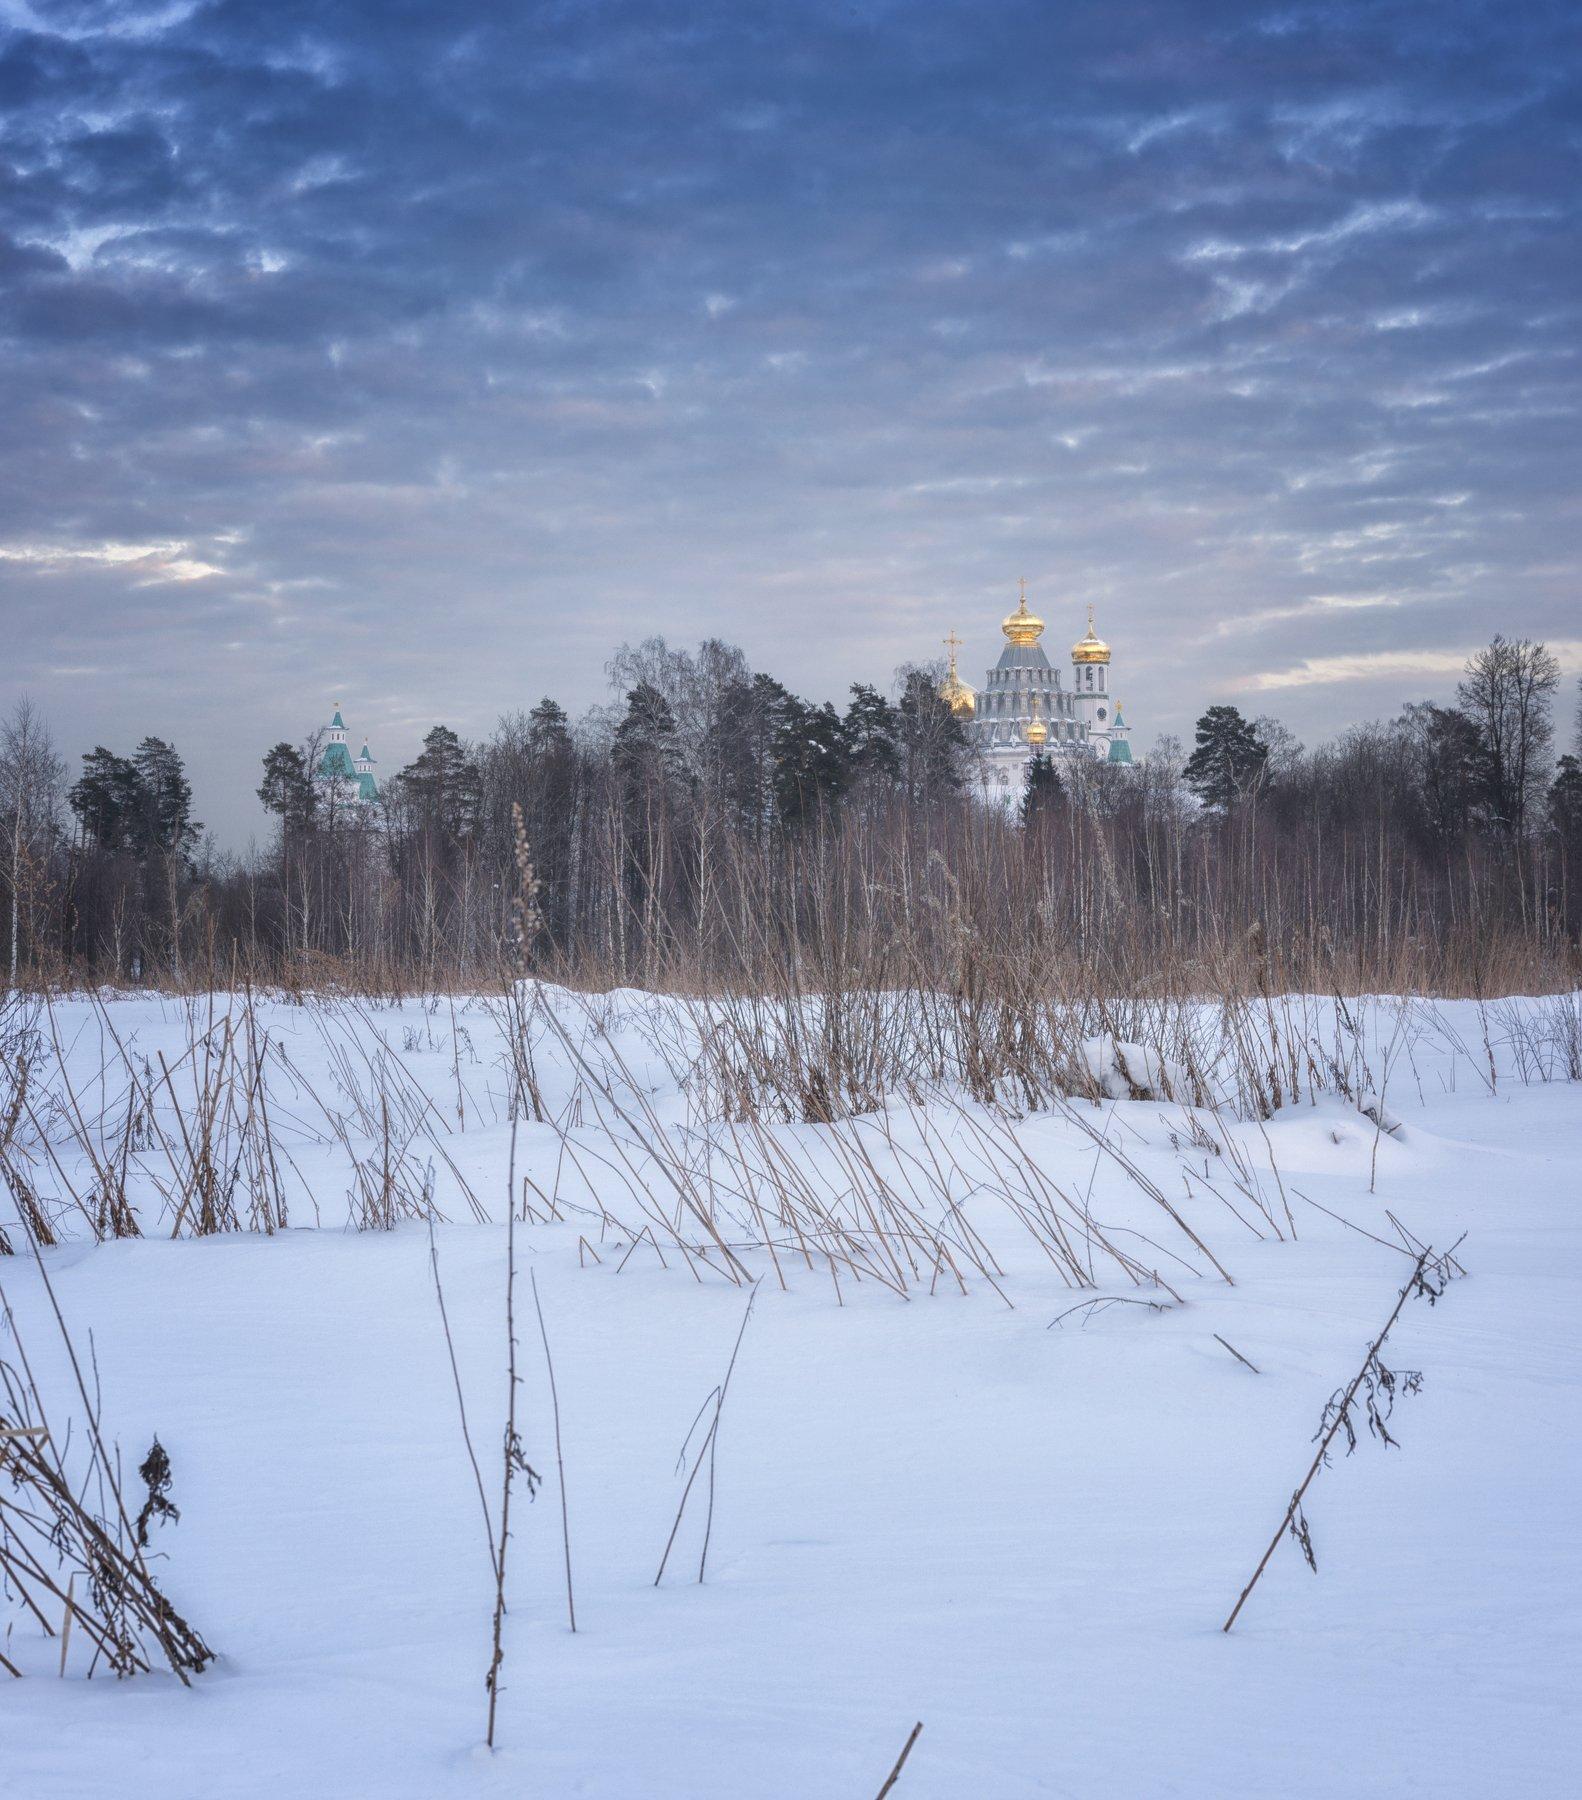 зима,храм,вечер,природа,пейзаж,природа,архитектура, Павел Ныриков